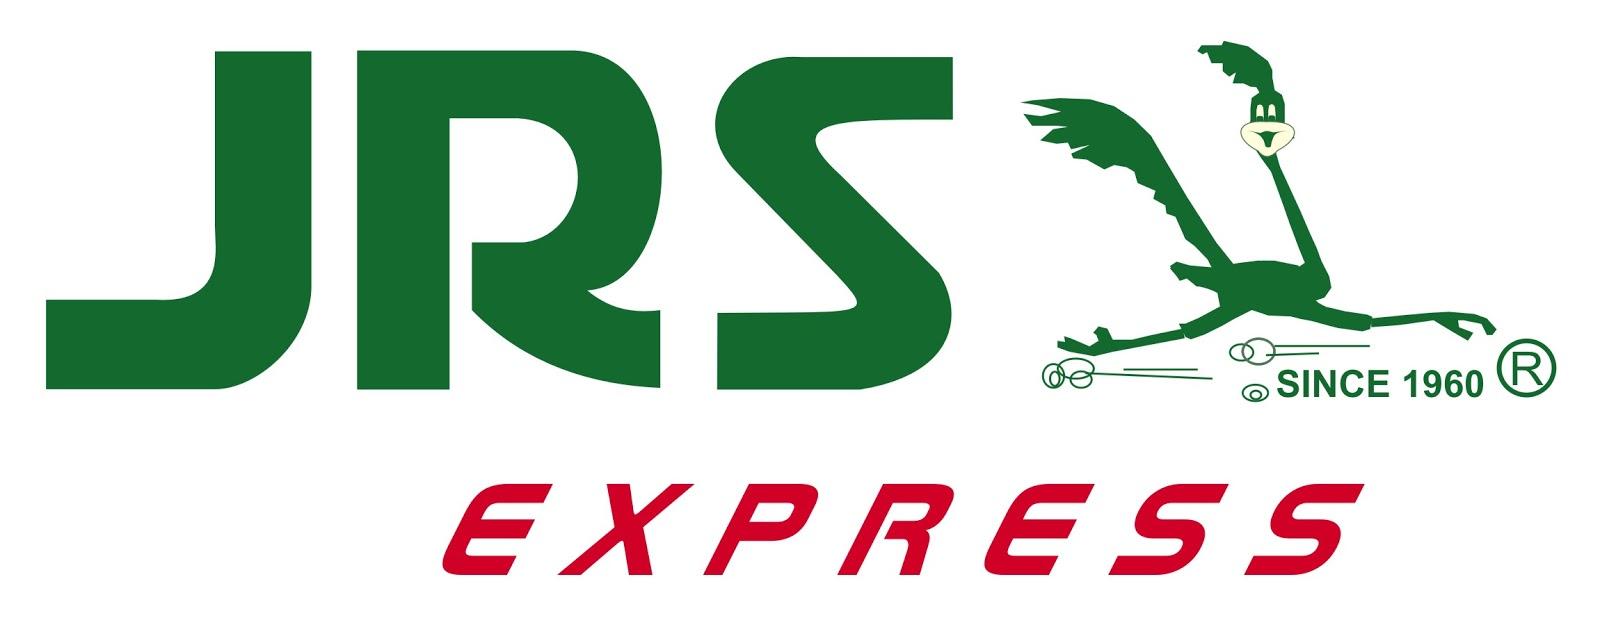 express - photo #32